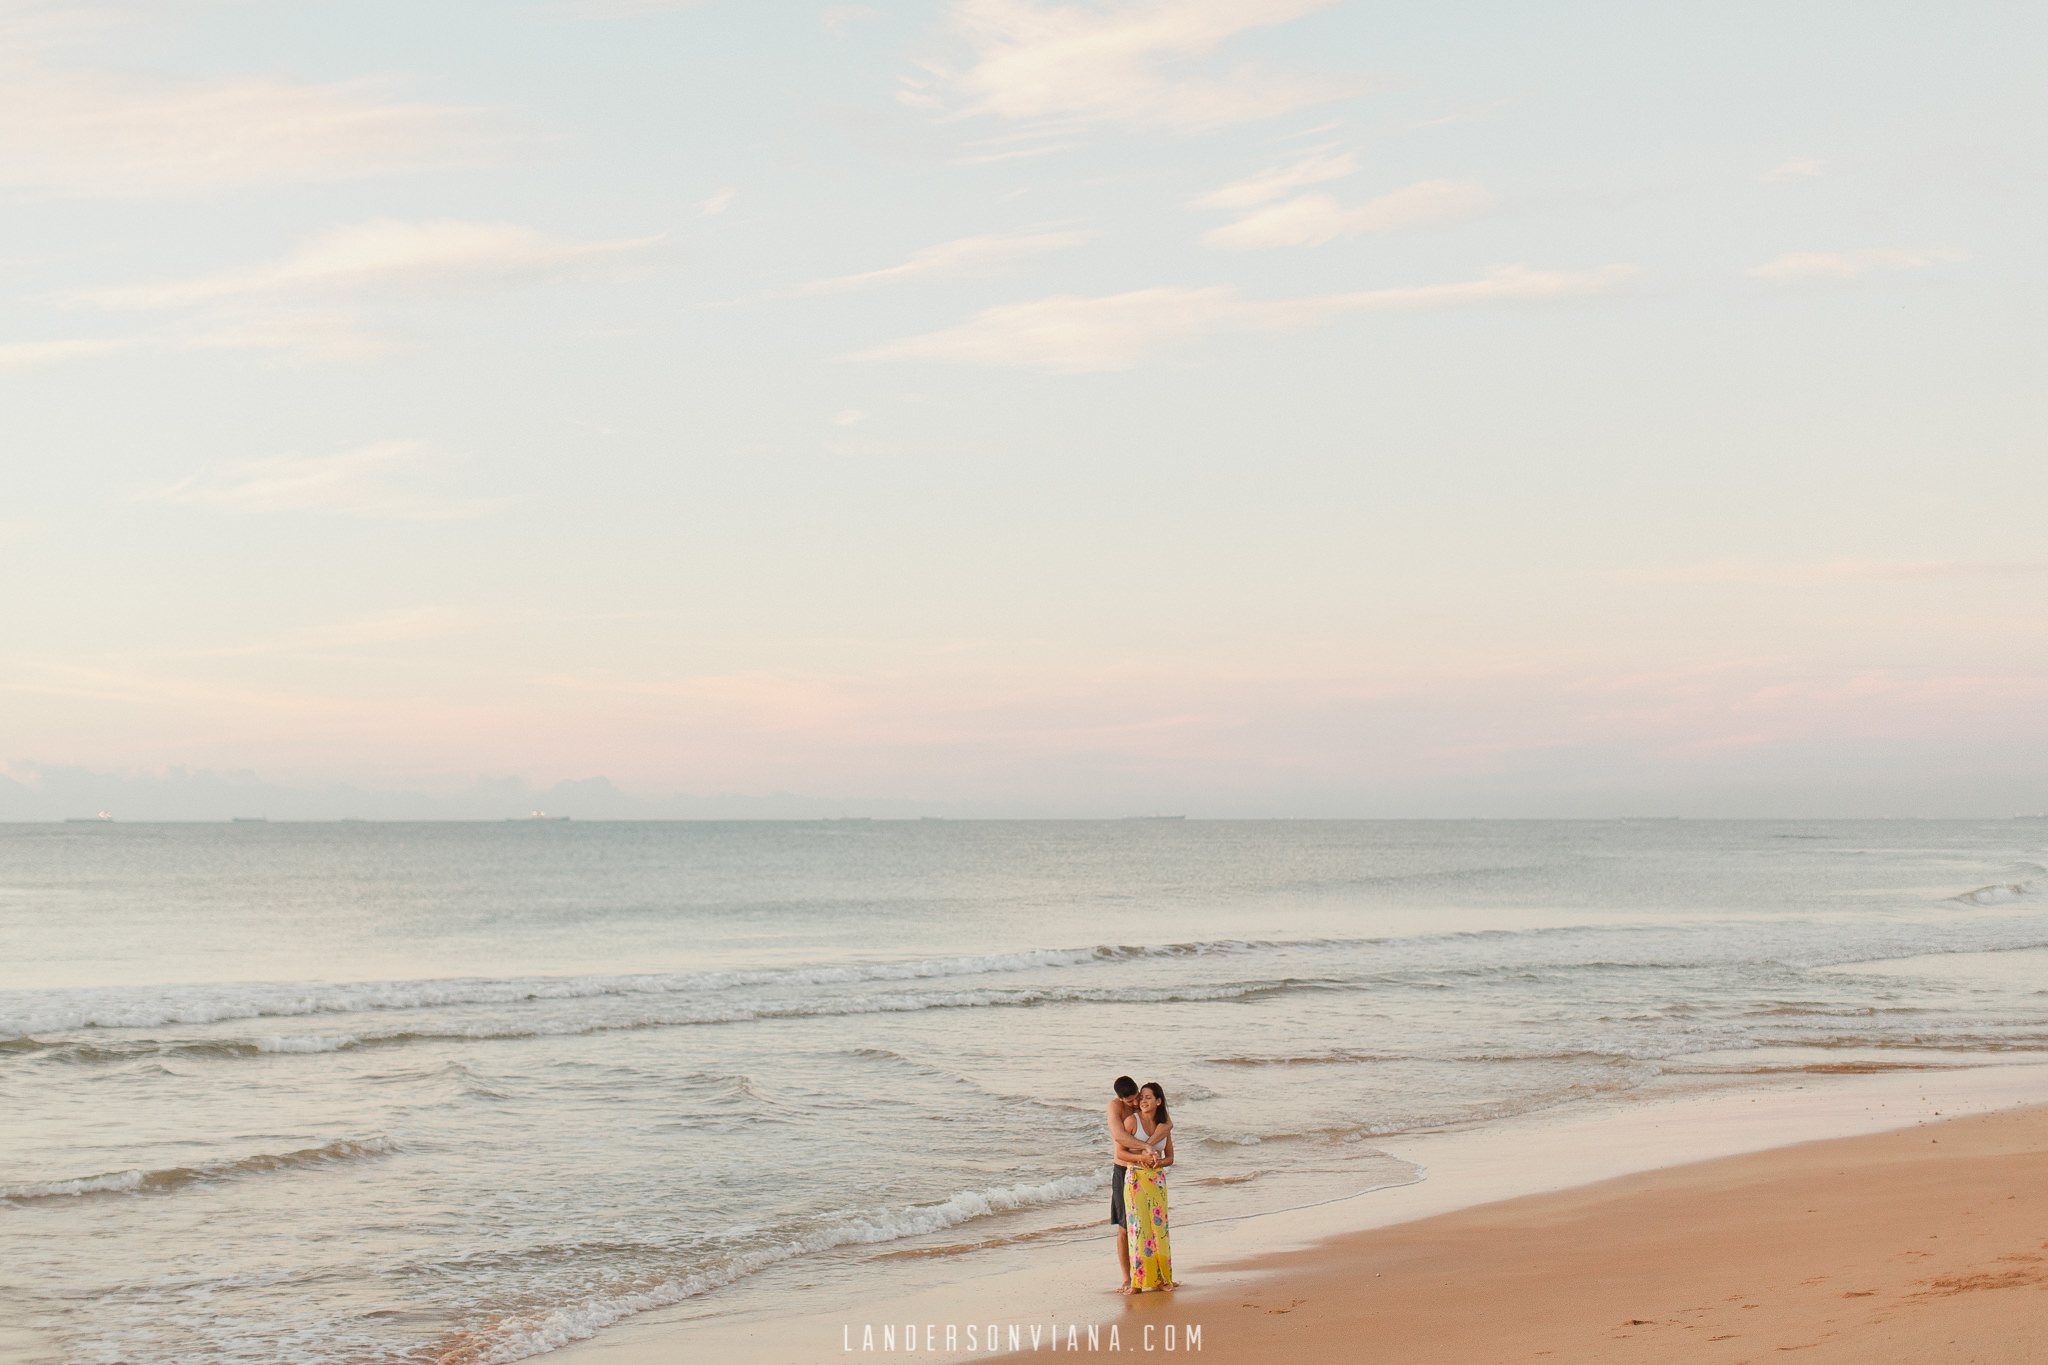 ensaio-pre-wedding-praia-landerson-viana-fotografia-casamento-pegueiobouquet-62.jpg